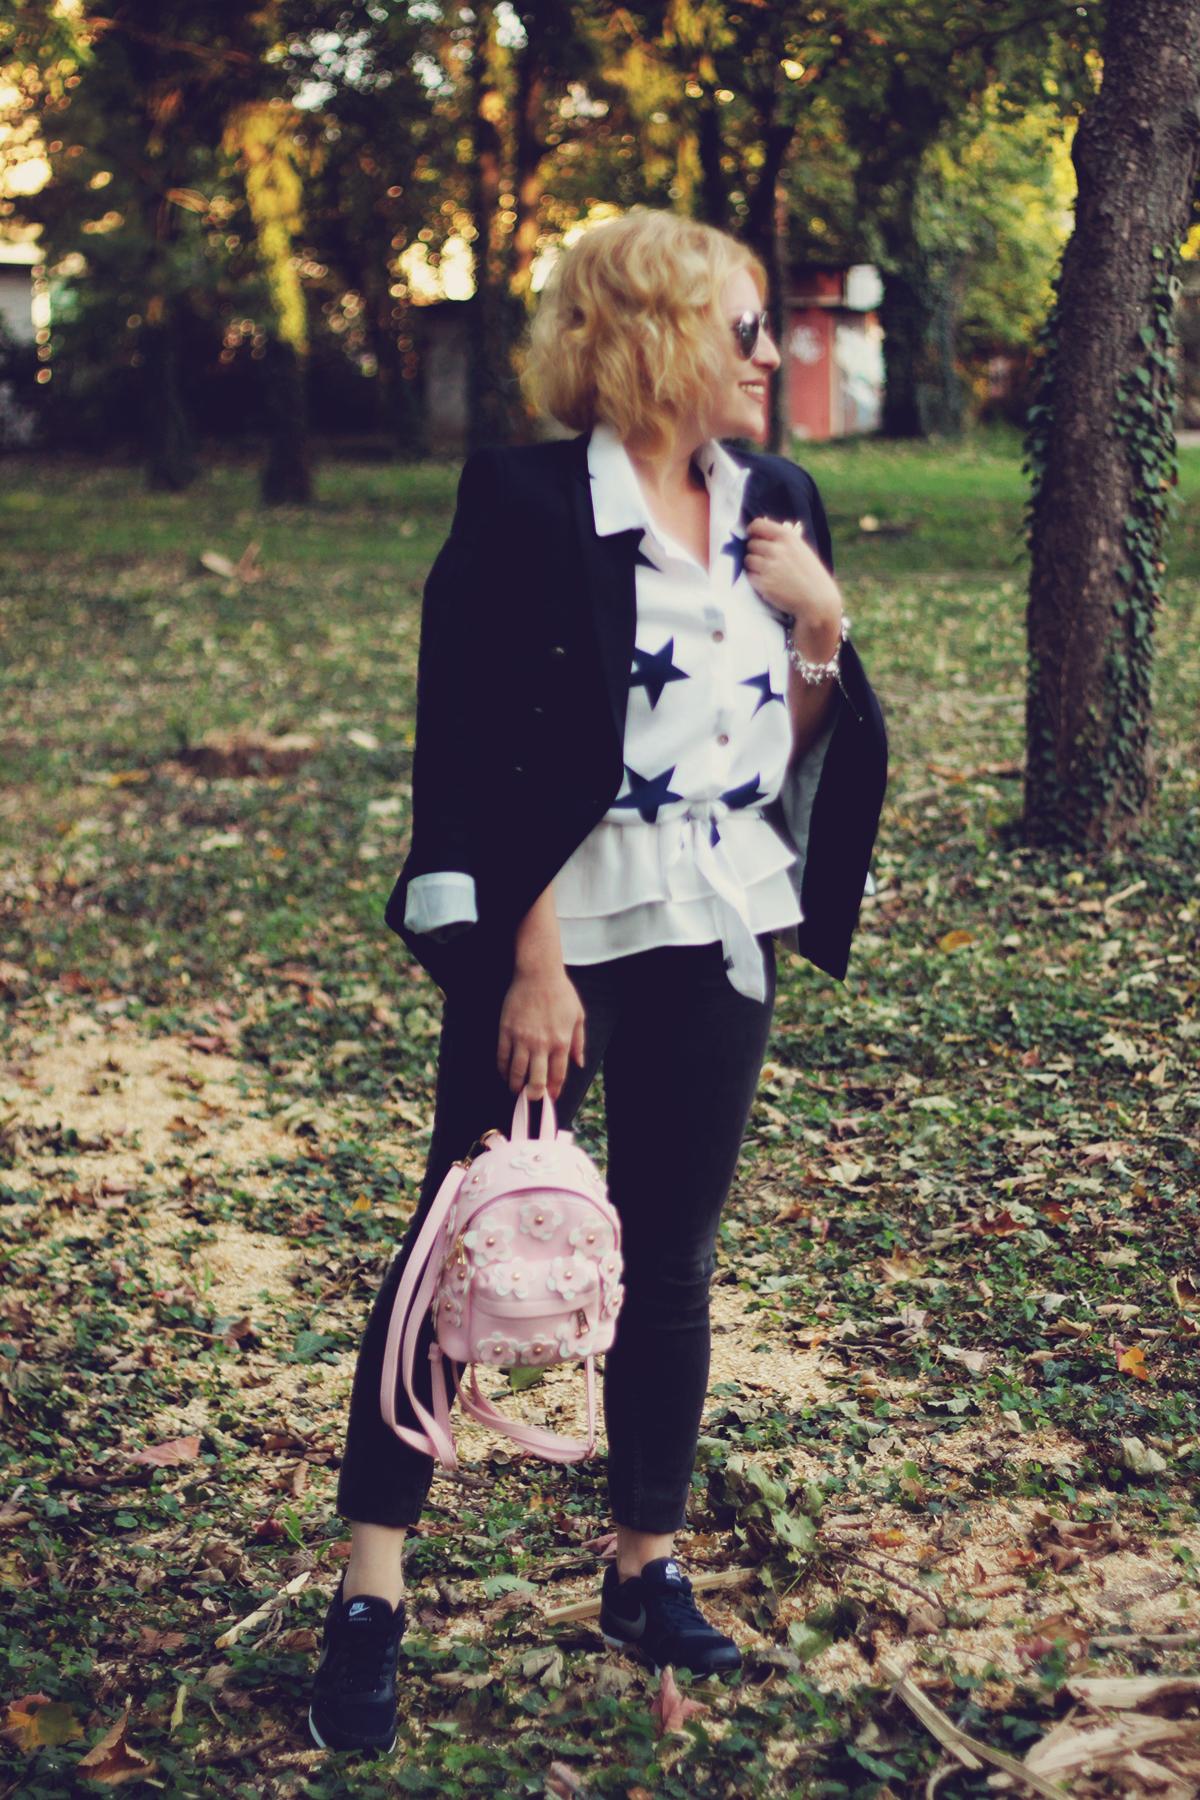 sammydress pink backpack, sammydress star shirt, navy blazer, nike runners, office sporty look